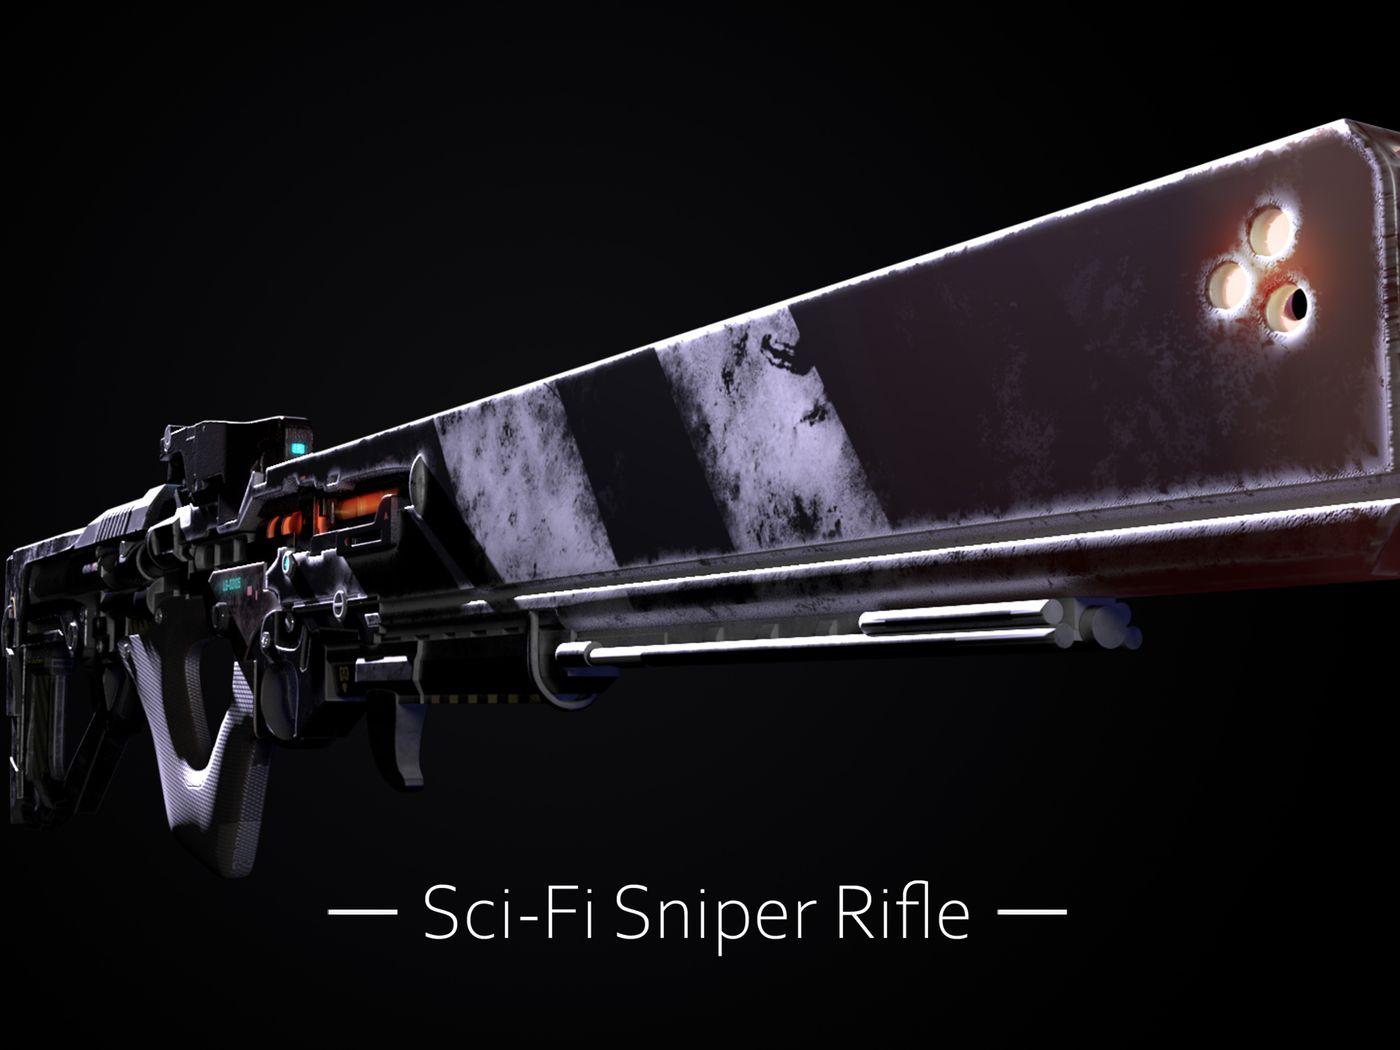 Sci-Fi Energy Sniper Rifle